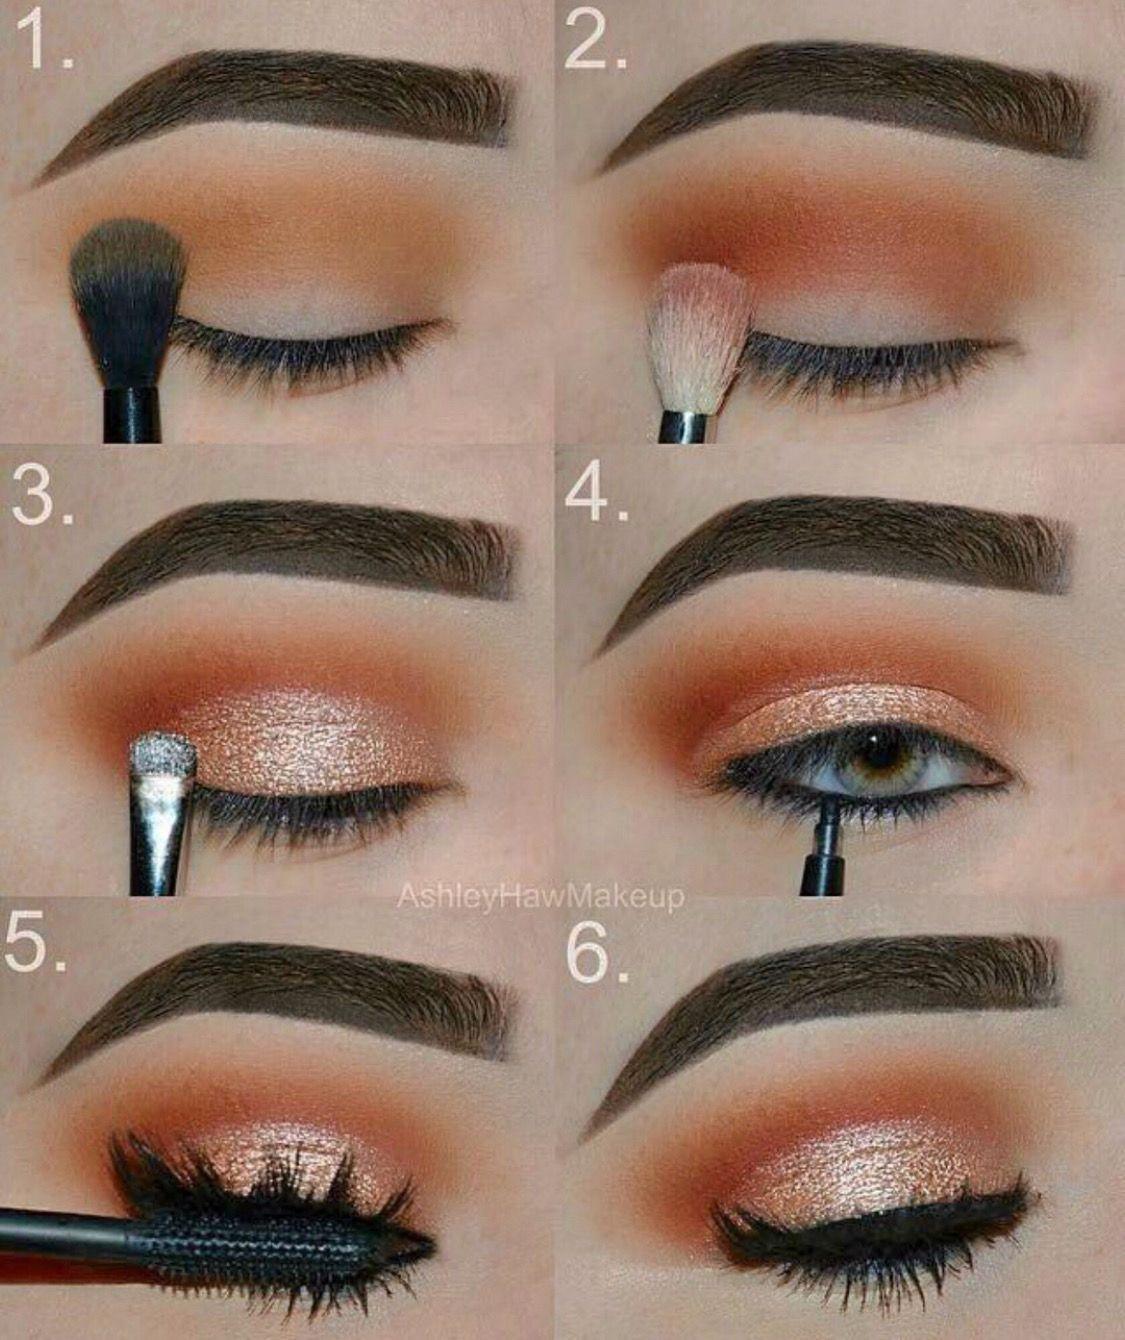 Maquiagem Caked Up In 12 Eye Makeup Makeup Eye Makeup Tips  Eye